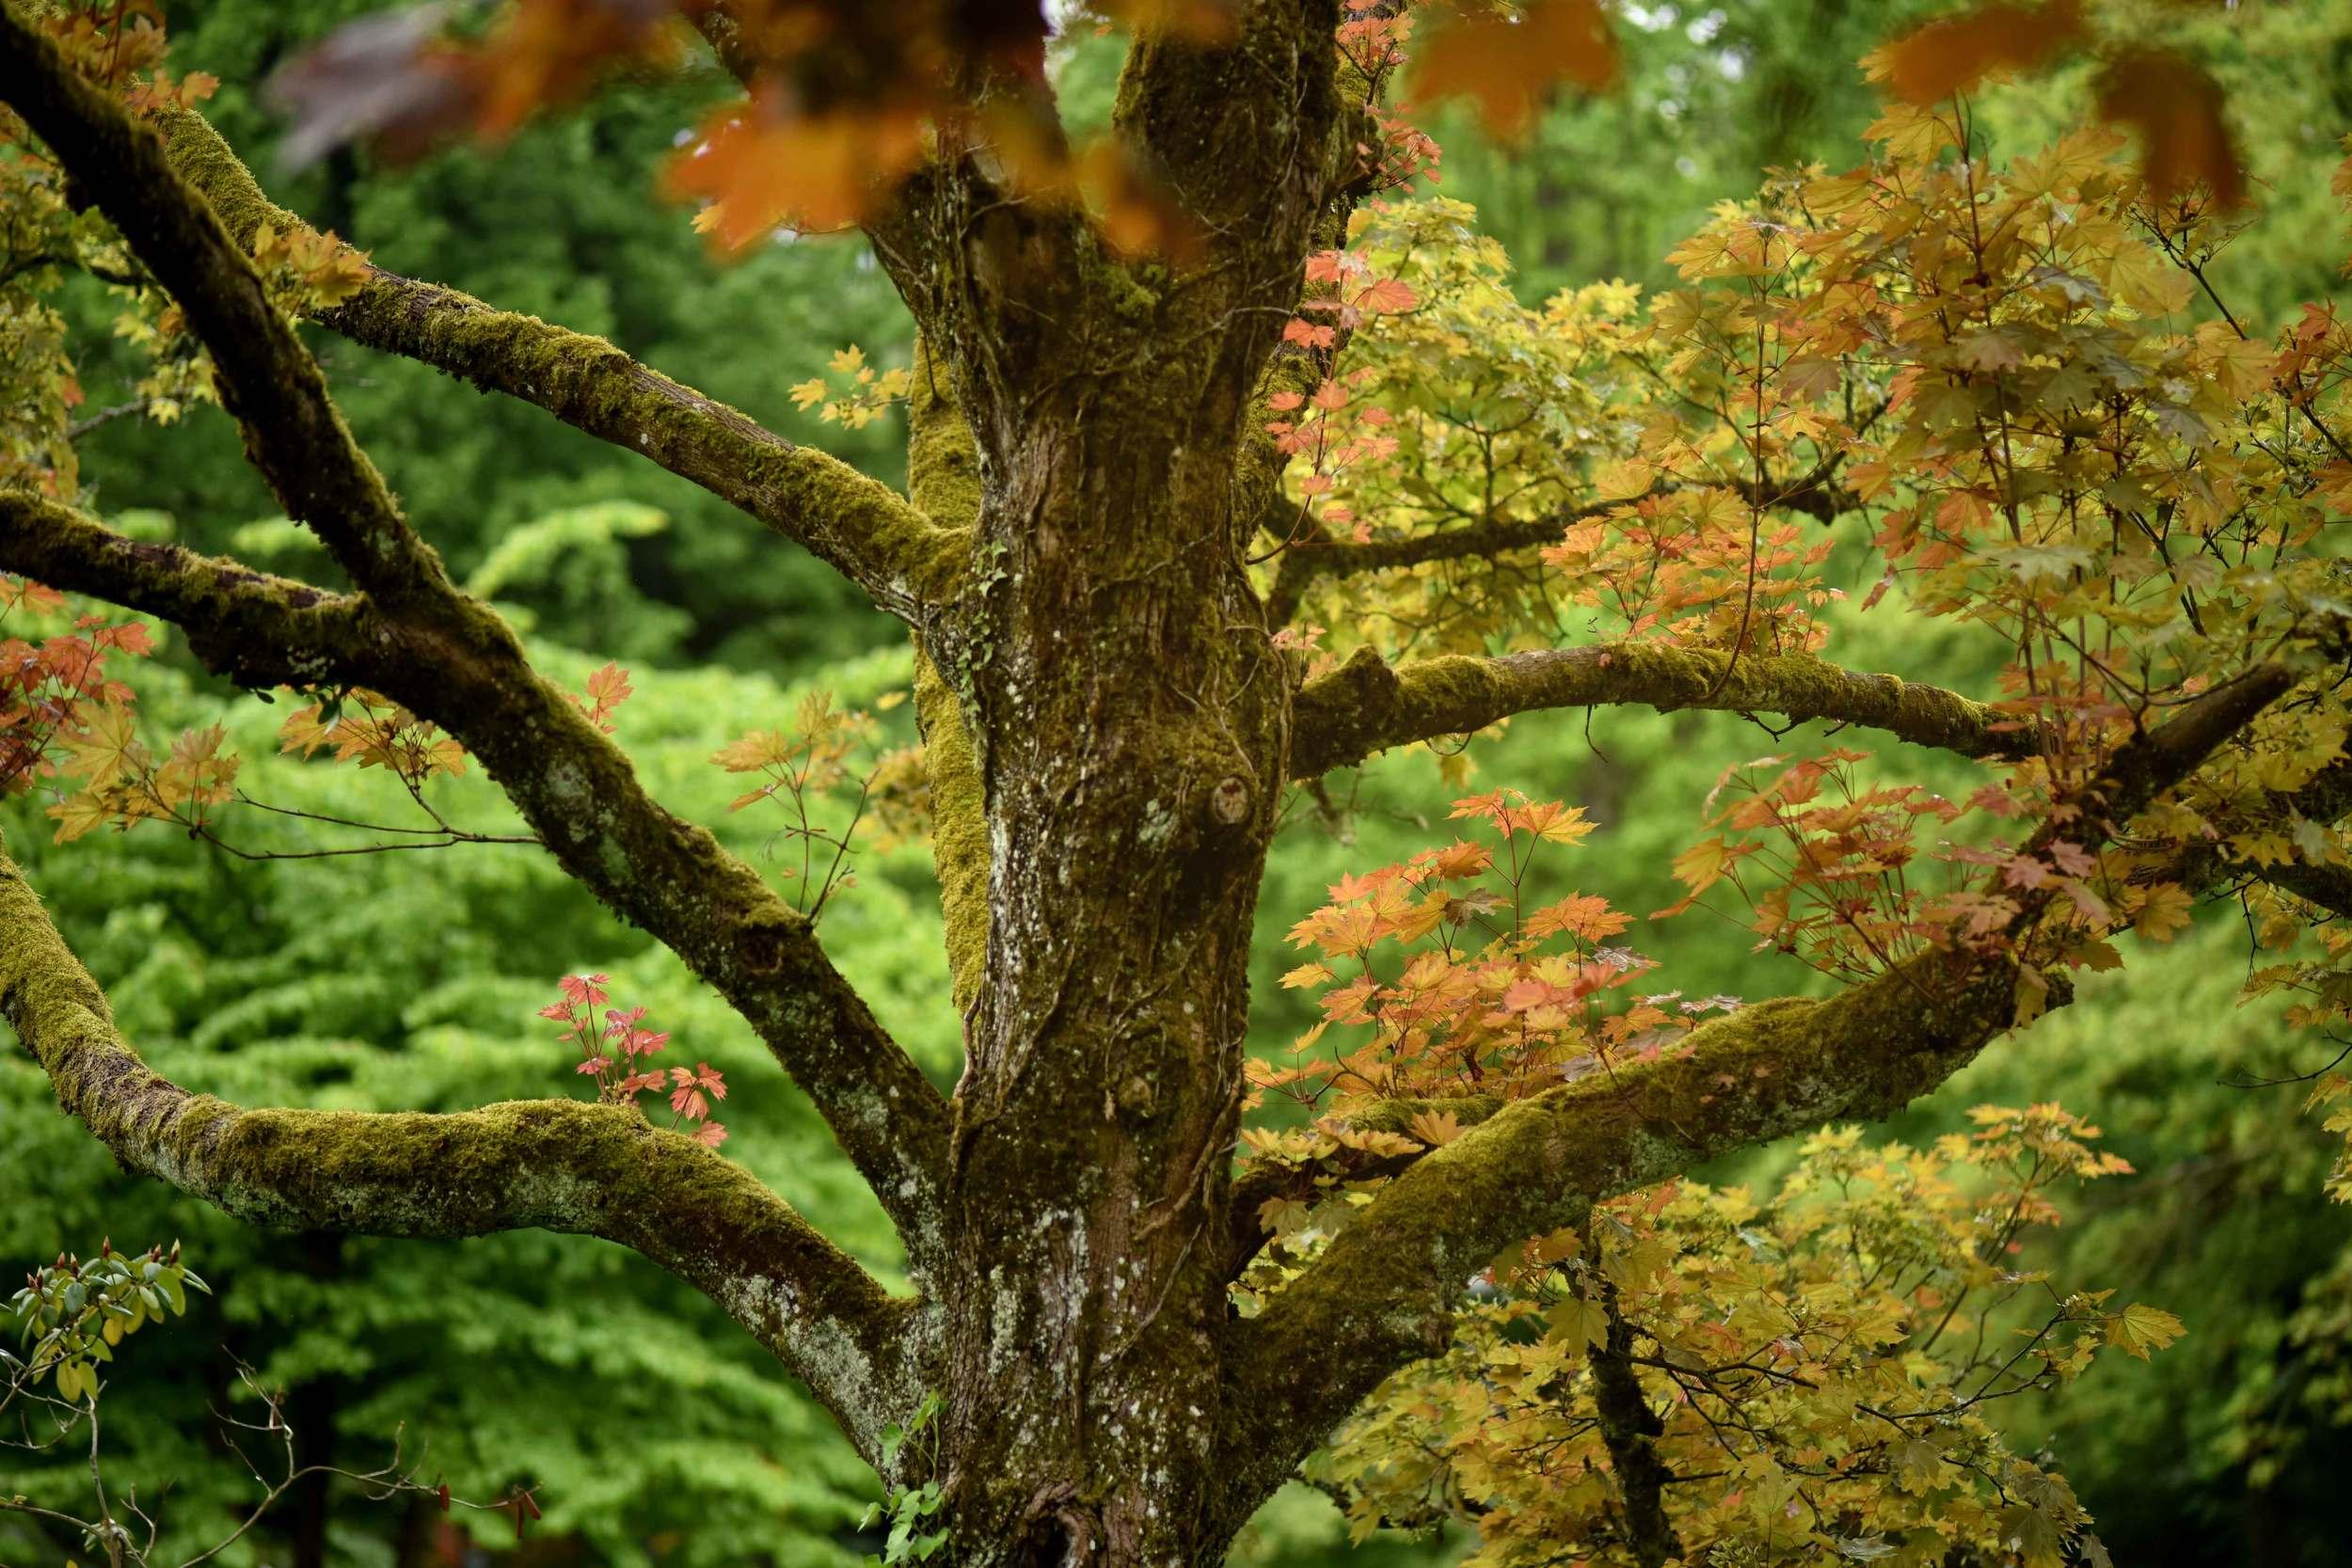 An ancient tree, Gönneranlage, historic park, Baden Baden, Germany. Image©sourcingstyle.com